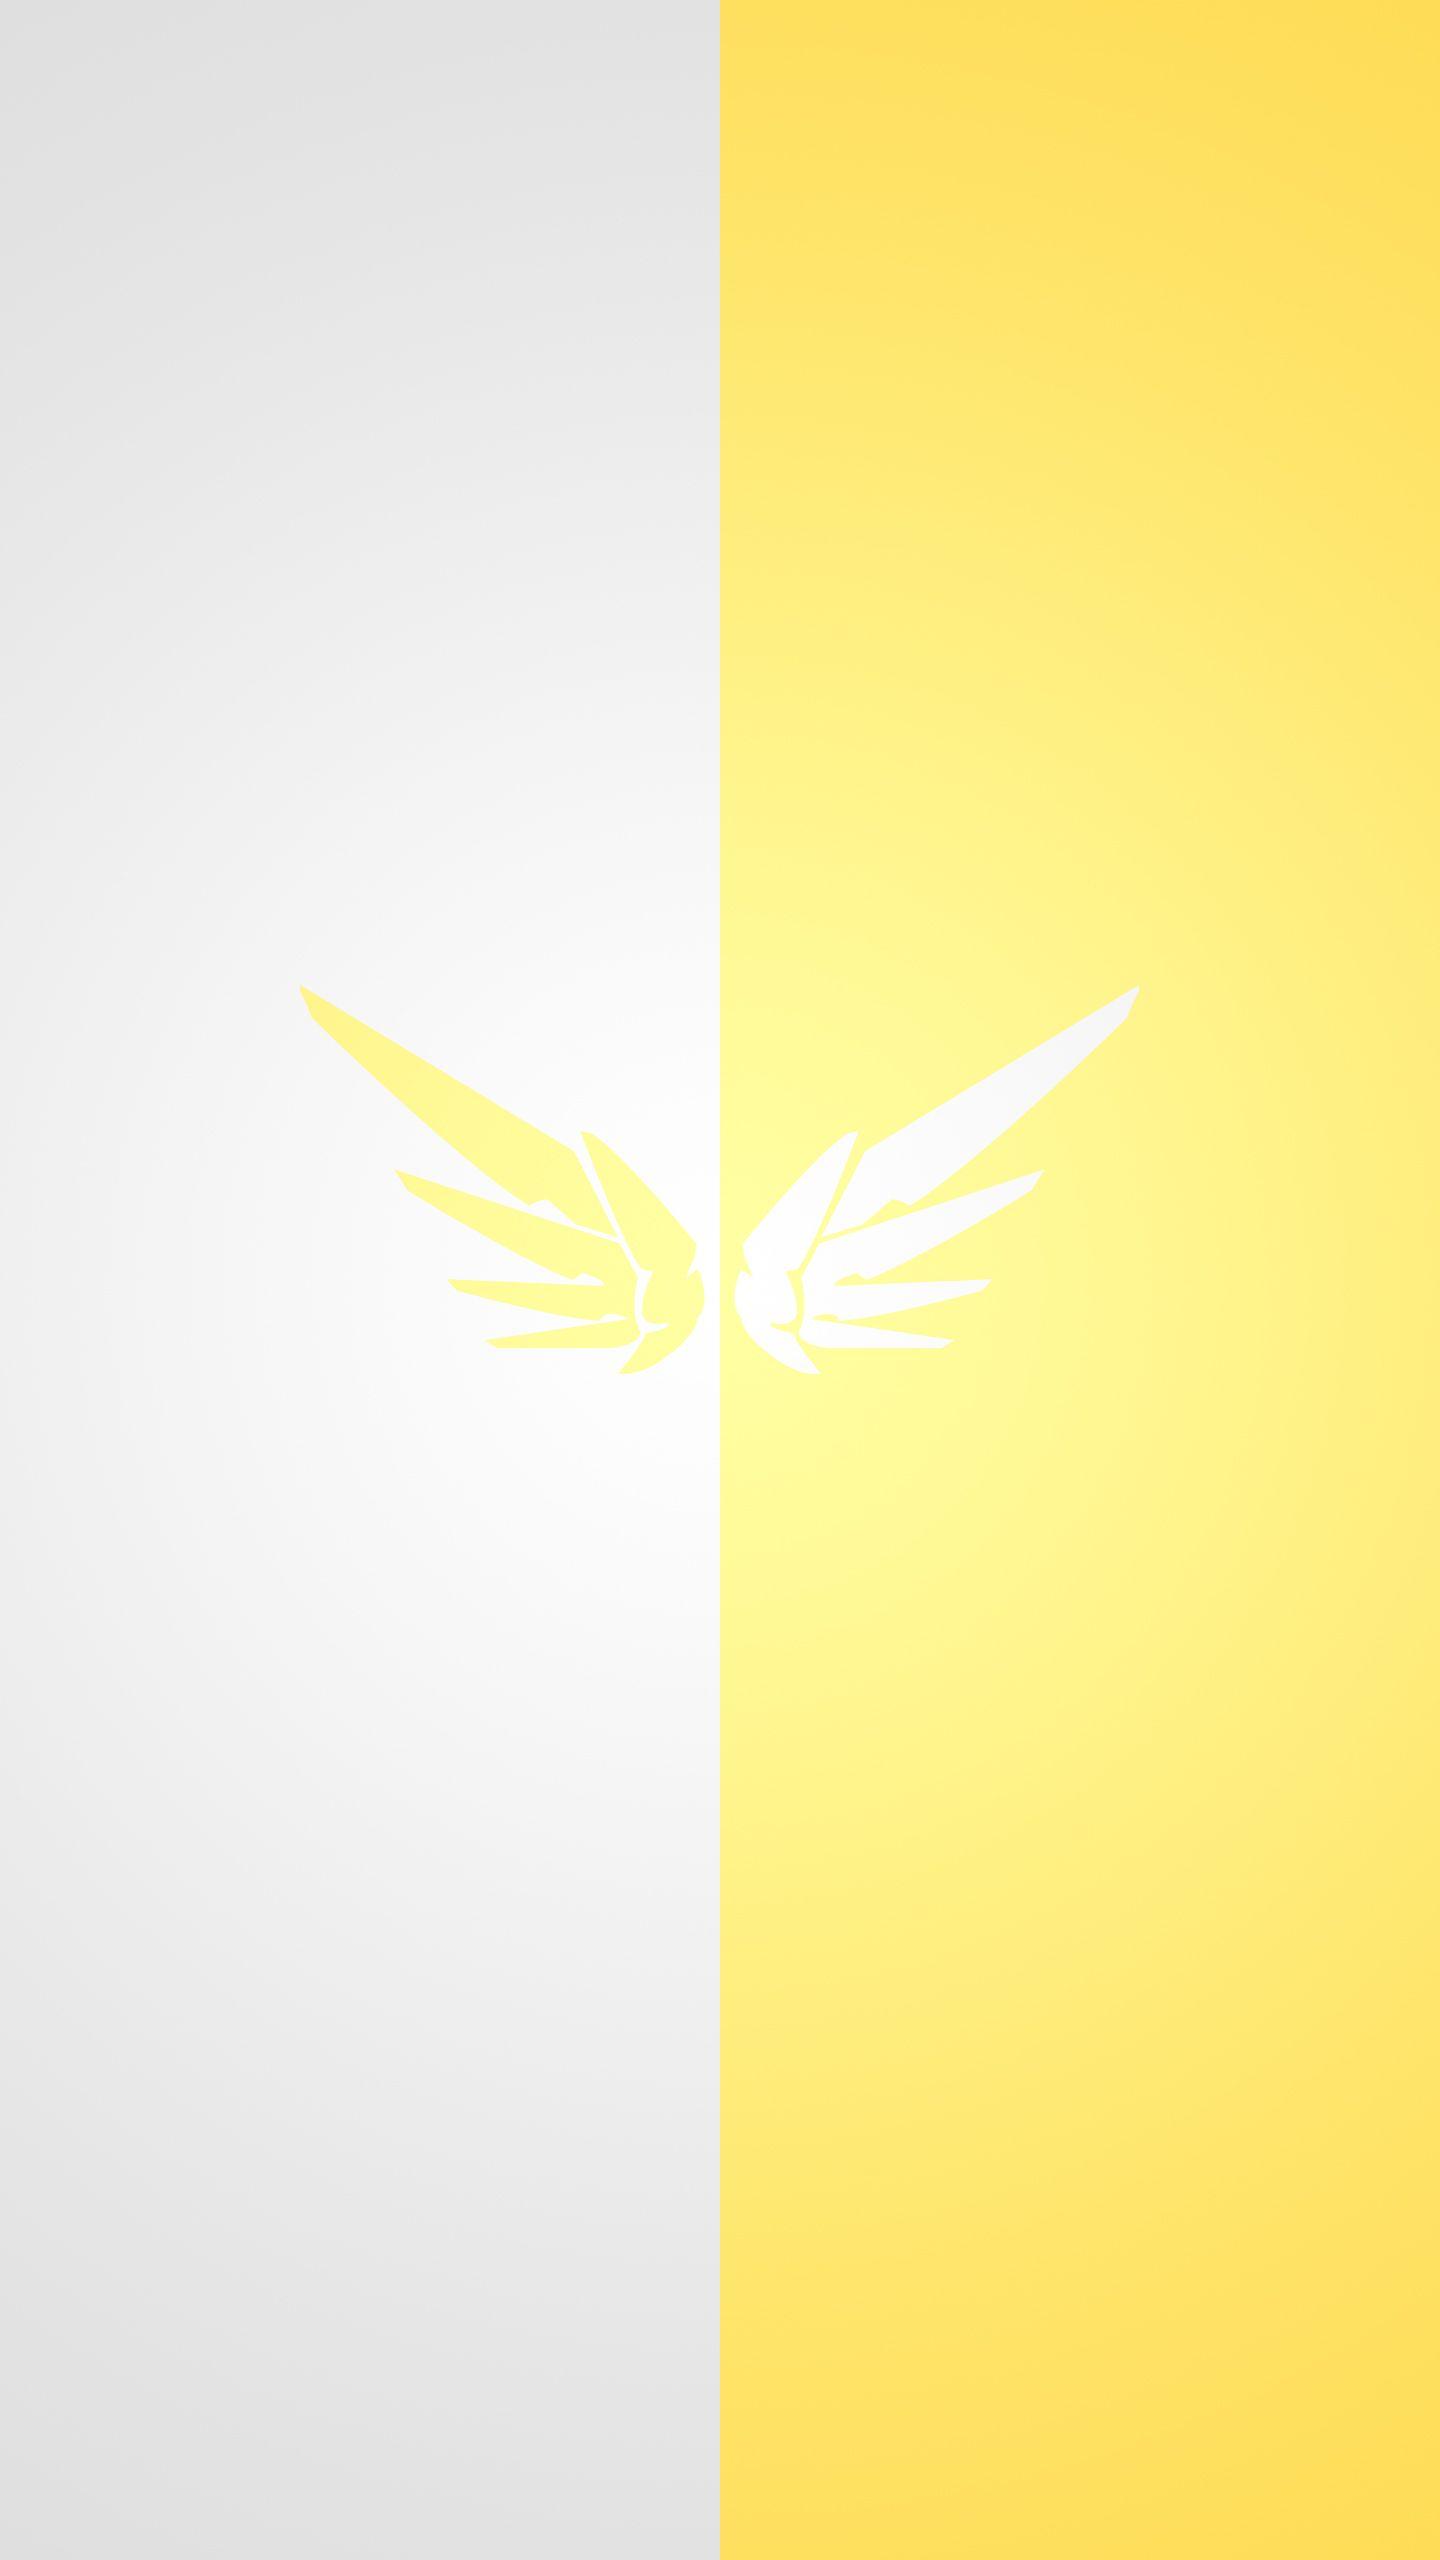 Overwatch - Mercy Wallpaper for V20 | Overwatch | Pinterest ...